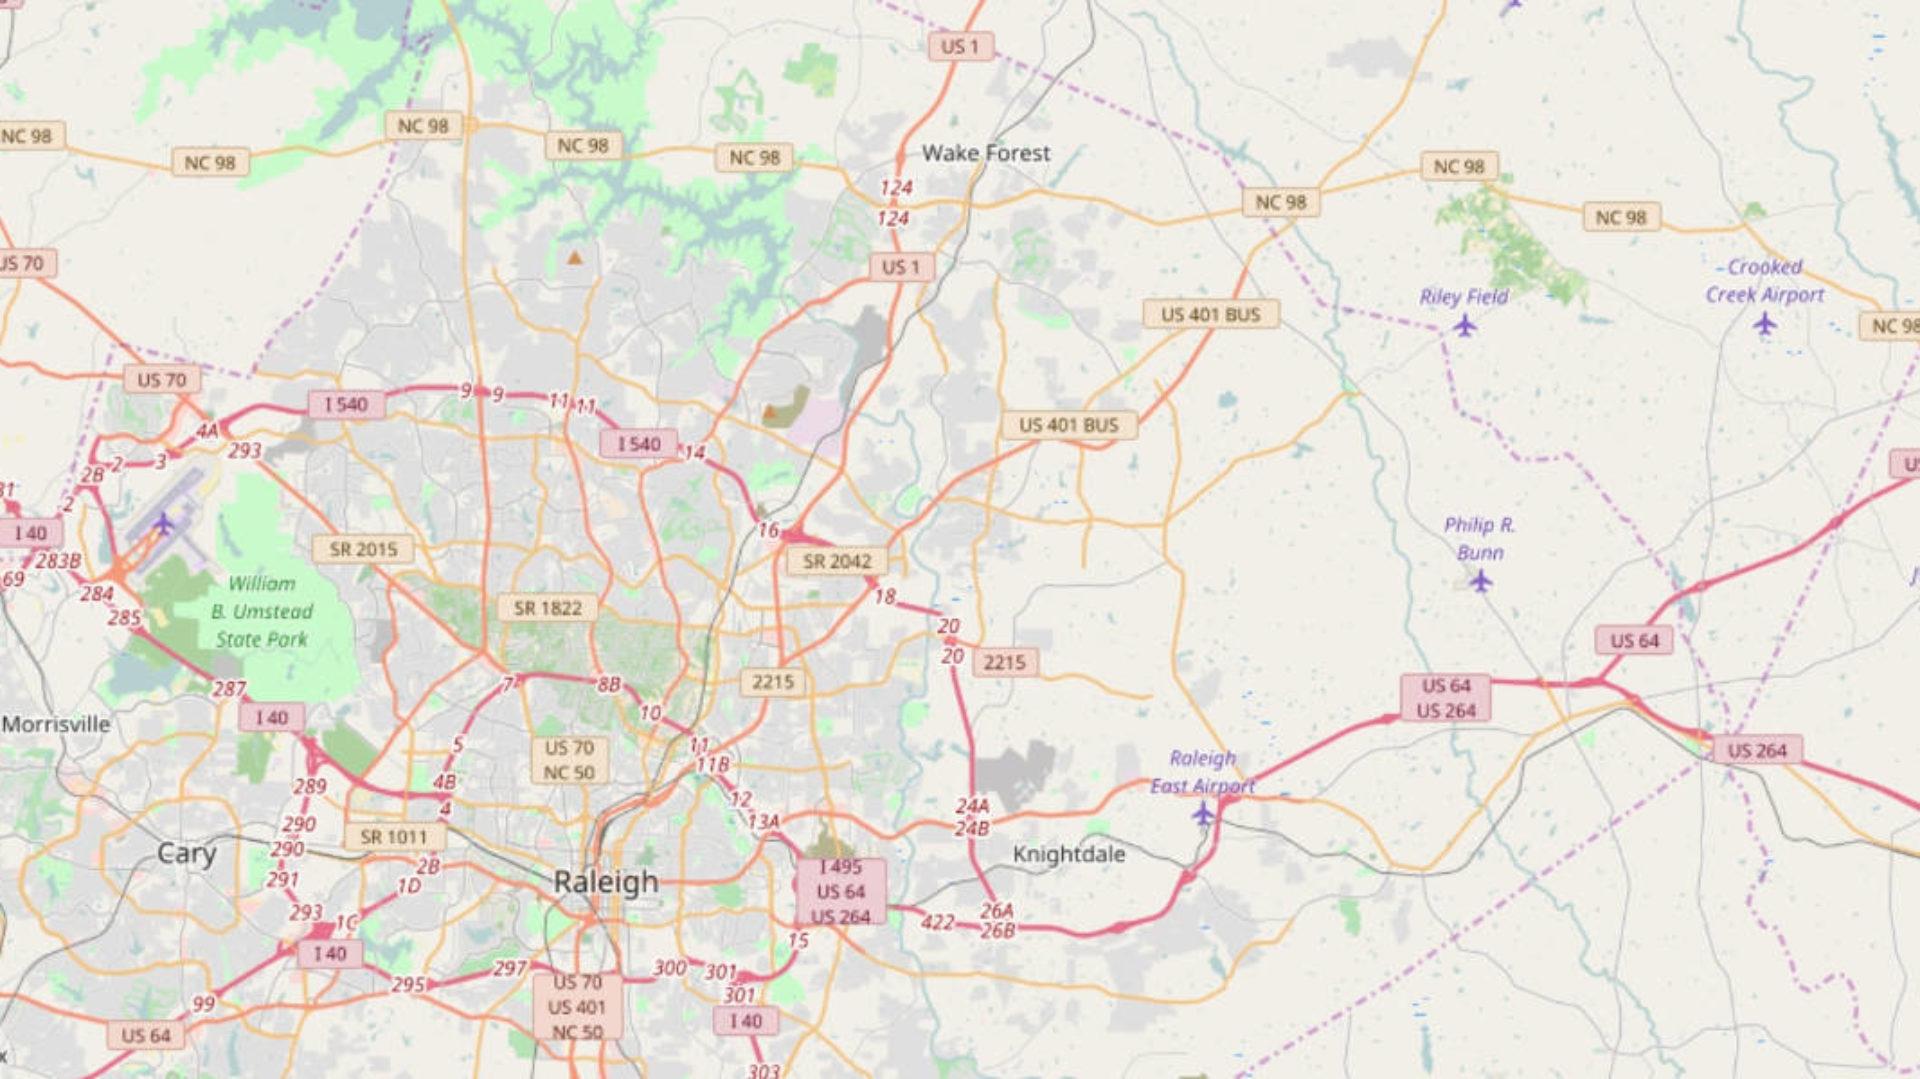 North Carolina Geography Rebuilding The Ncgs